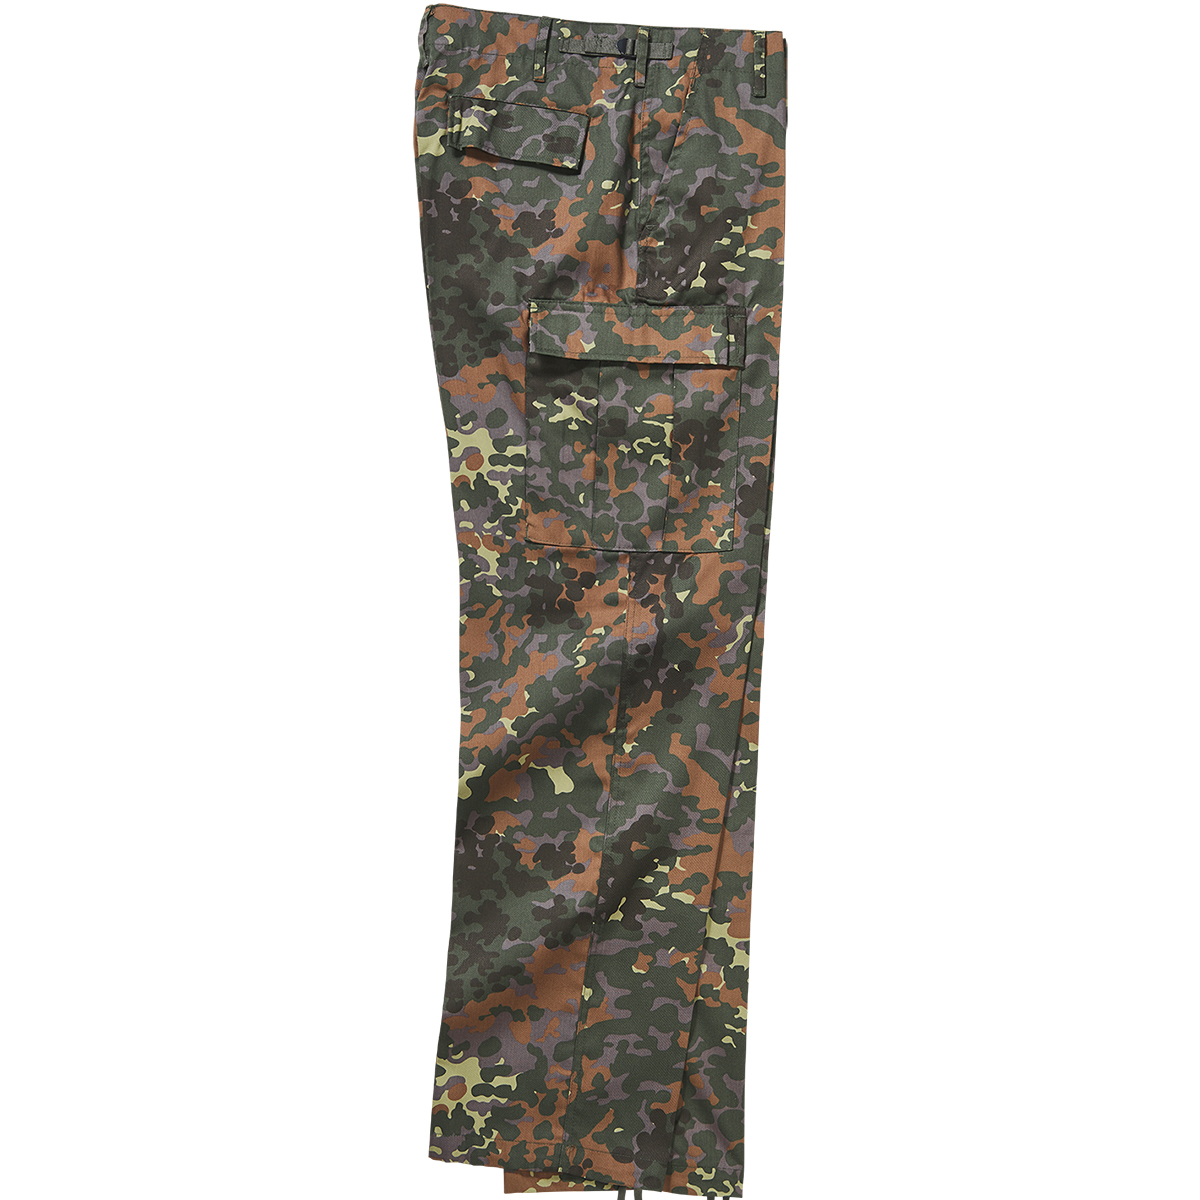 Combate-Militar-Brandit-U-S-Ranger-Hombres-Paintball-Pantalones-Flecktarn-Camo